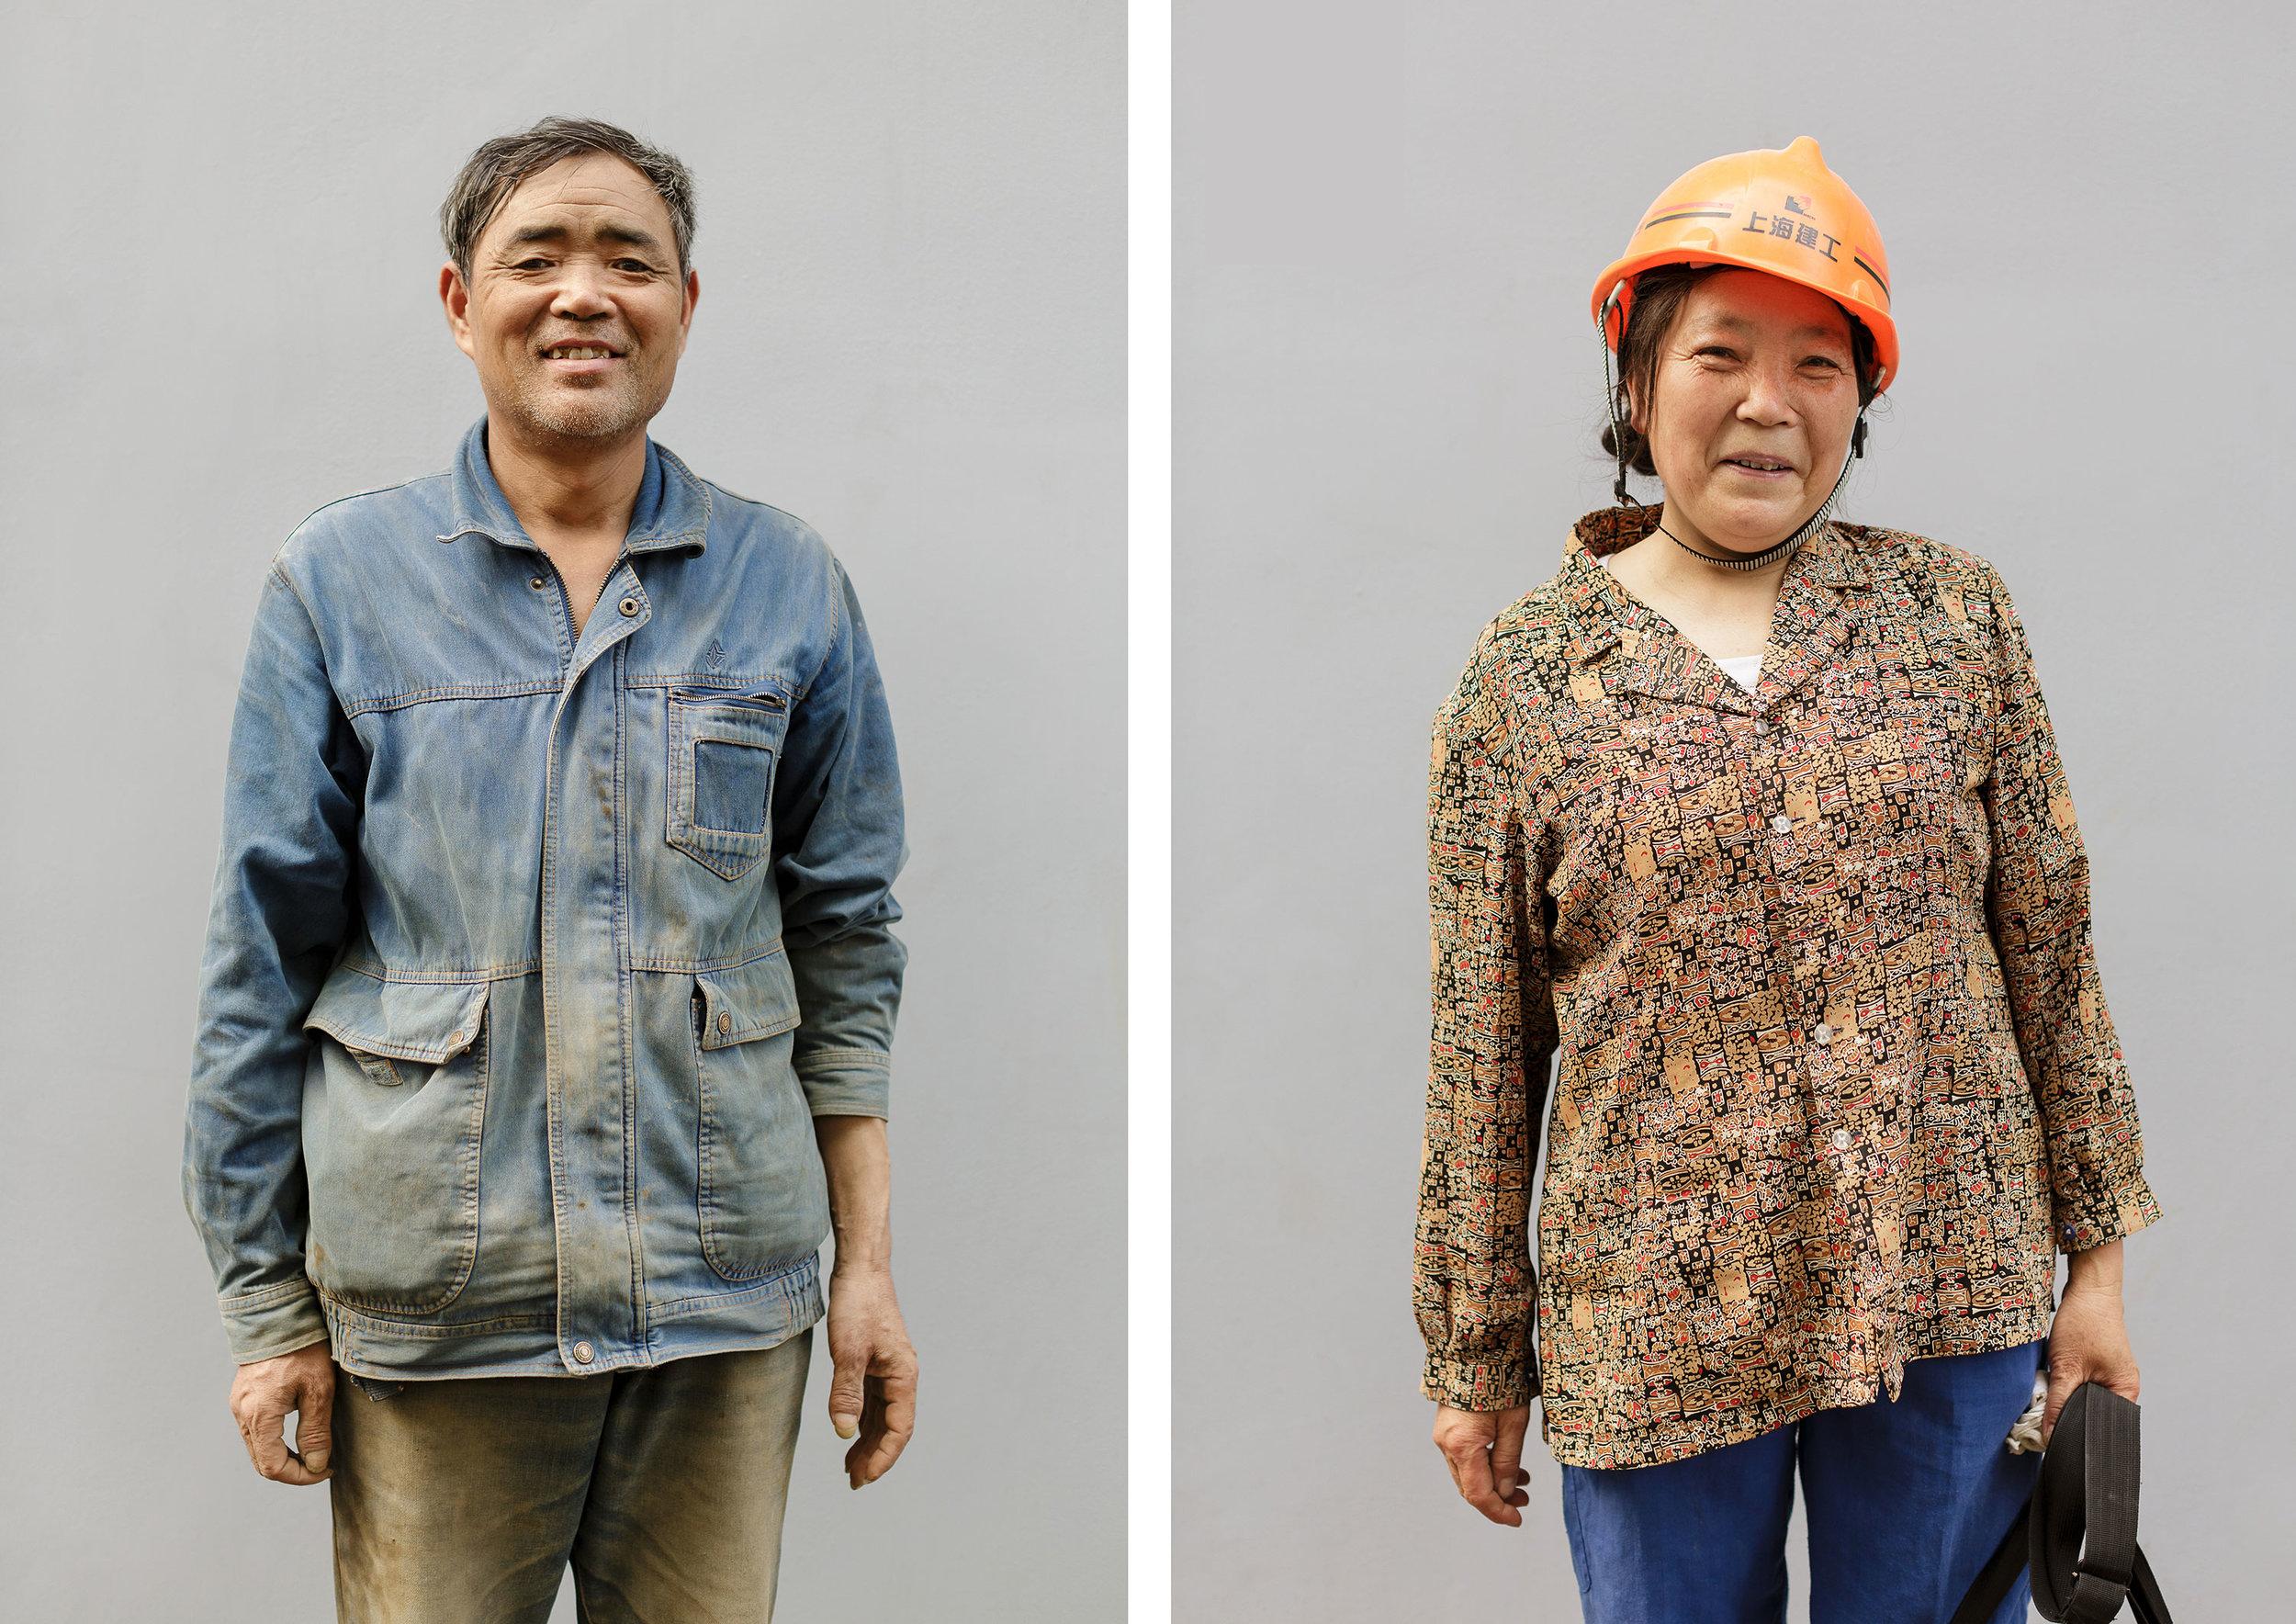 Shanghai_Tower-workers-and-building10.jpg